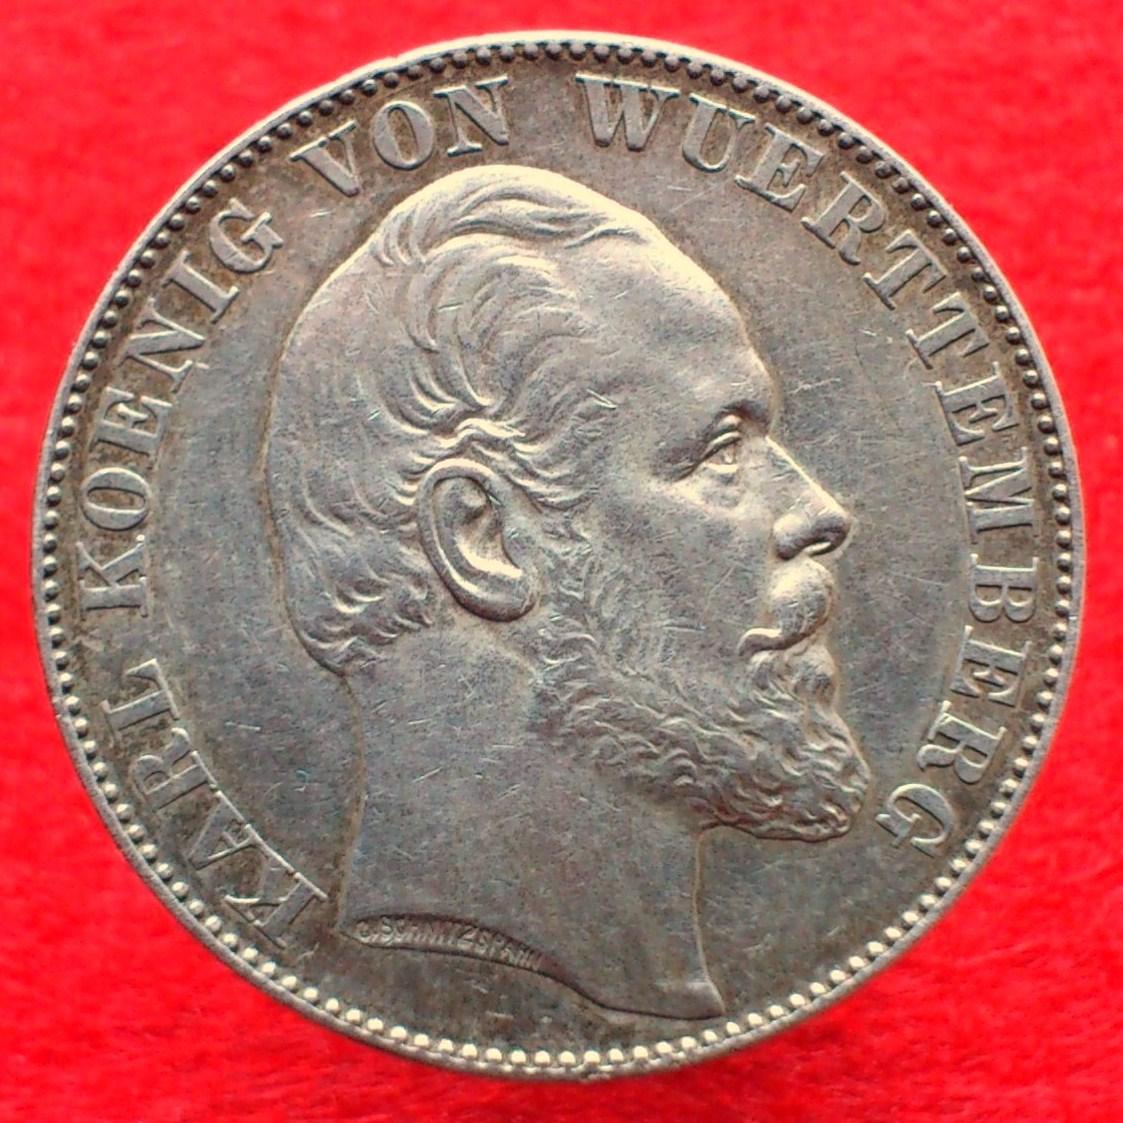 Mis monedas del Reino de Württemberg (Alemania) Ra8eip